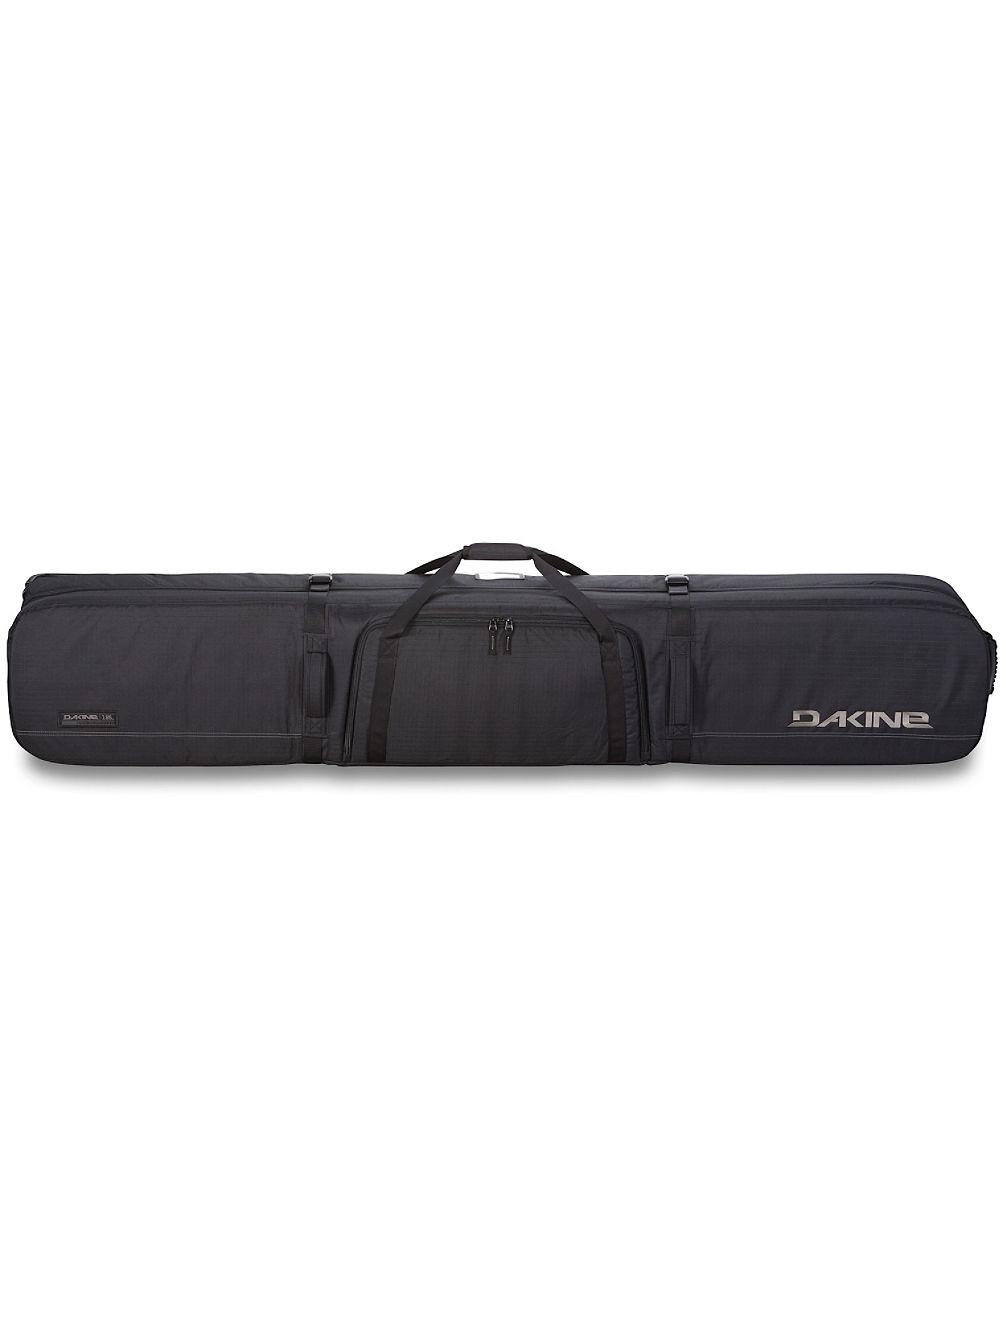 concourse-dbl-200-cm-skibag